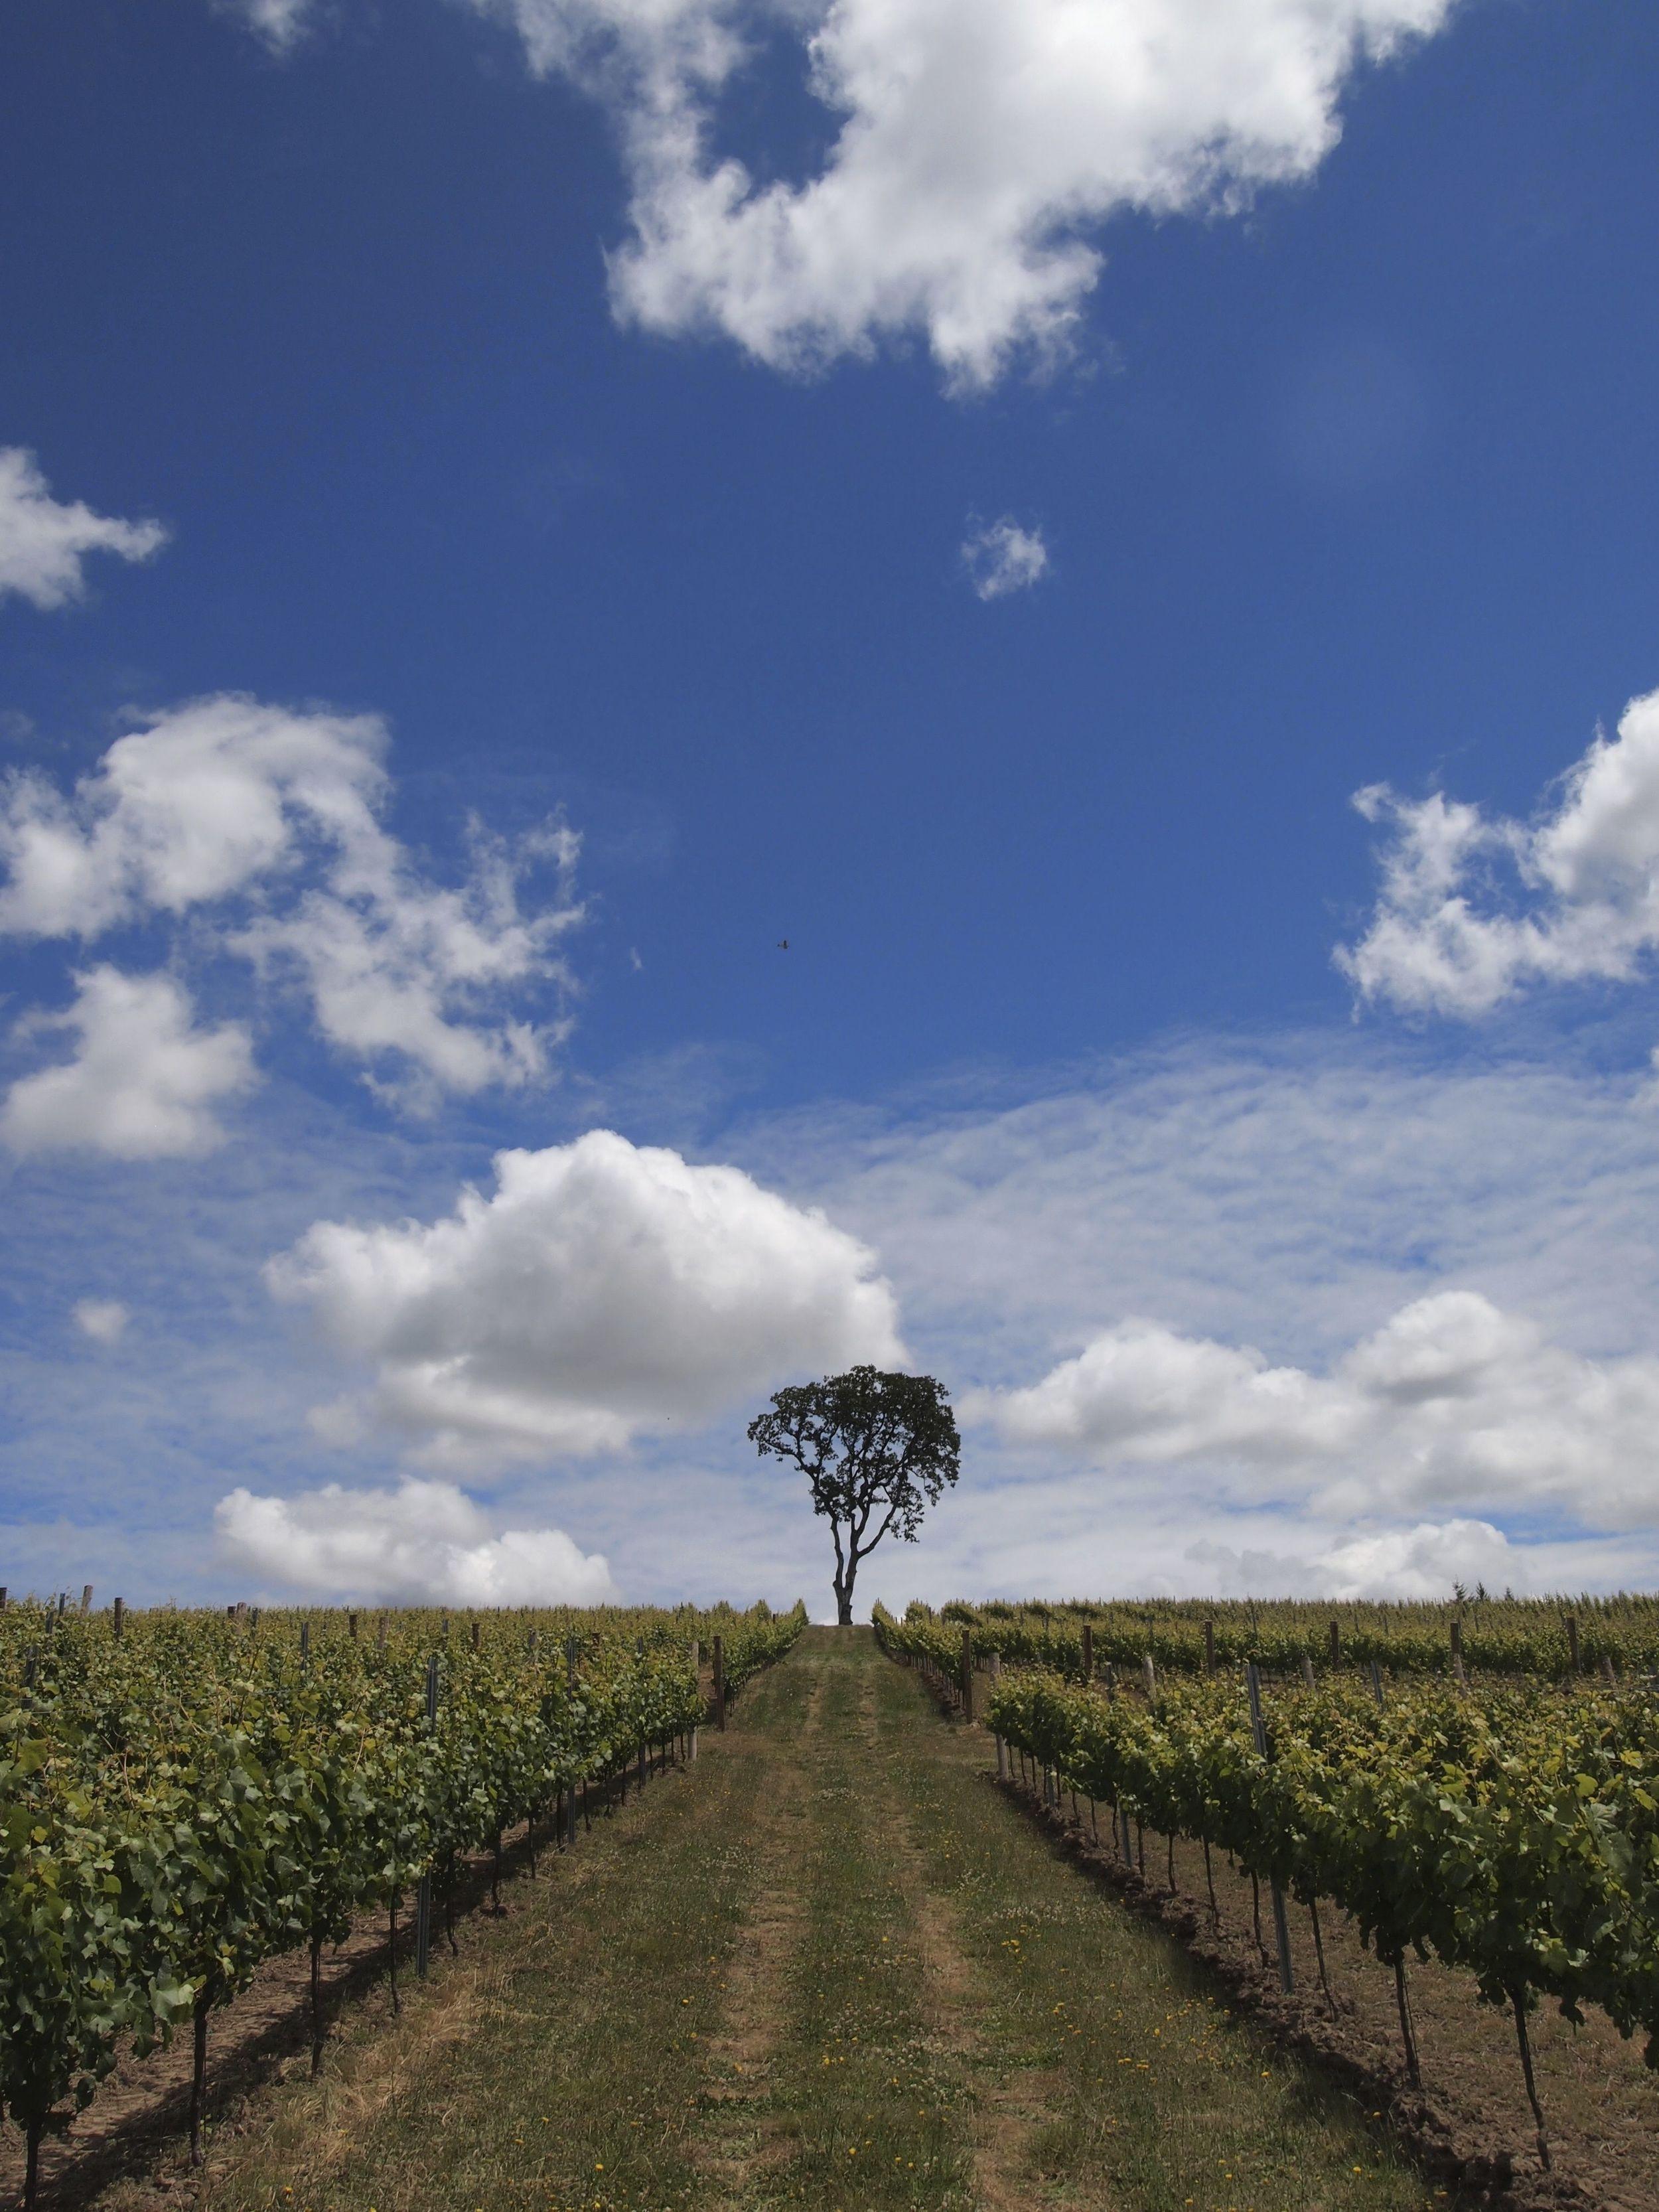 Erratic Oaks Vineyard belonging to Firesteed